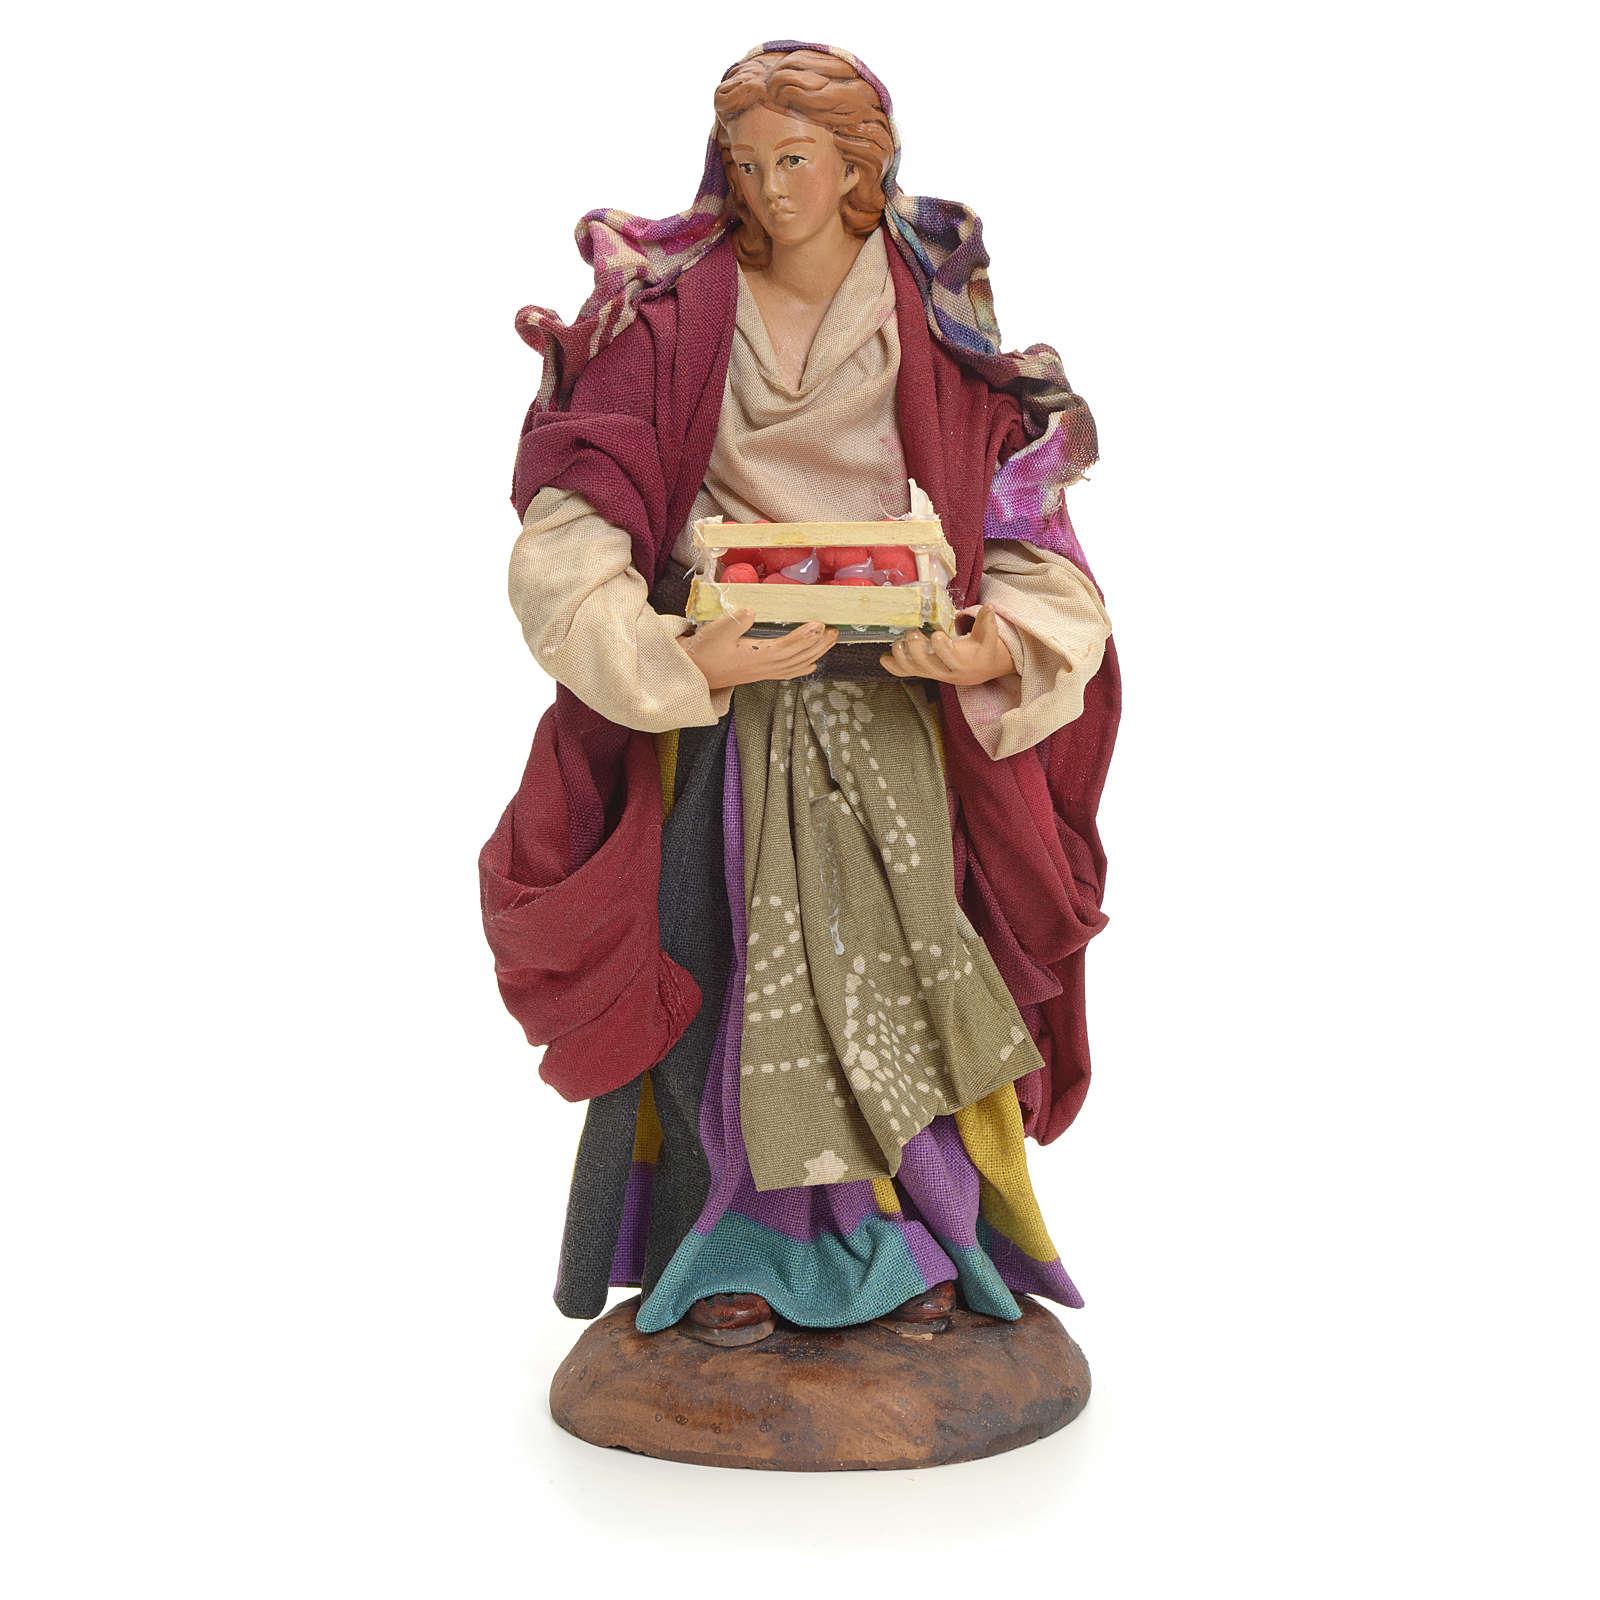 Neapolitan Nativity figurine, woman with apples, 18 cm 4